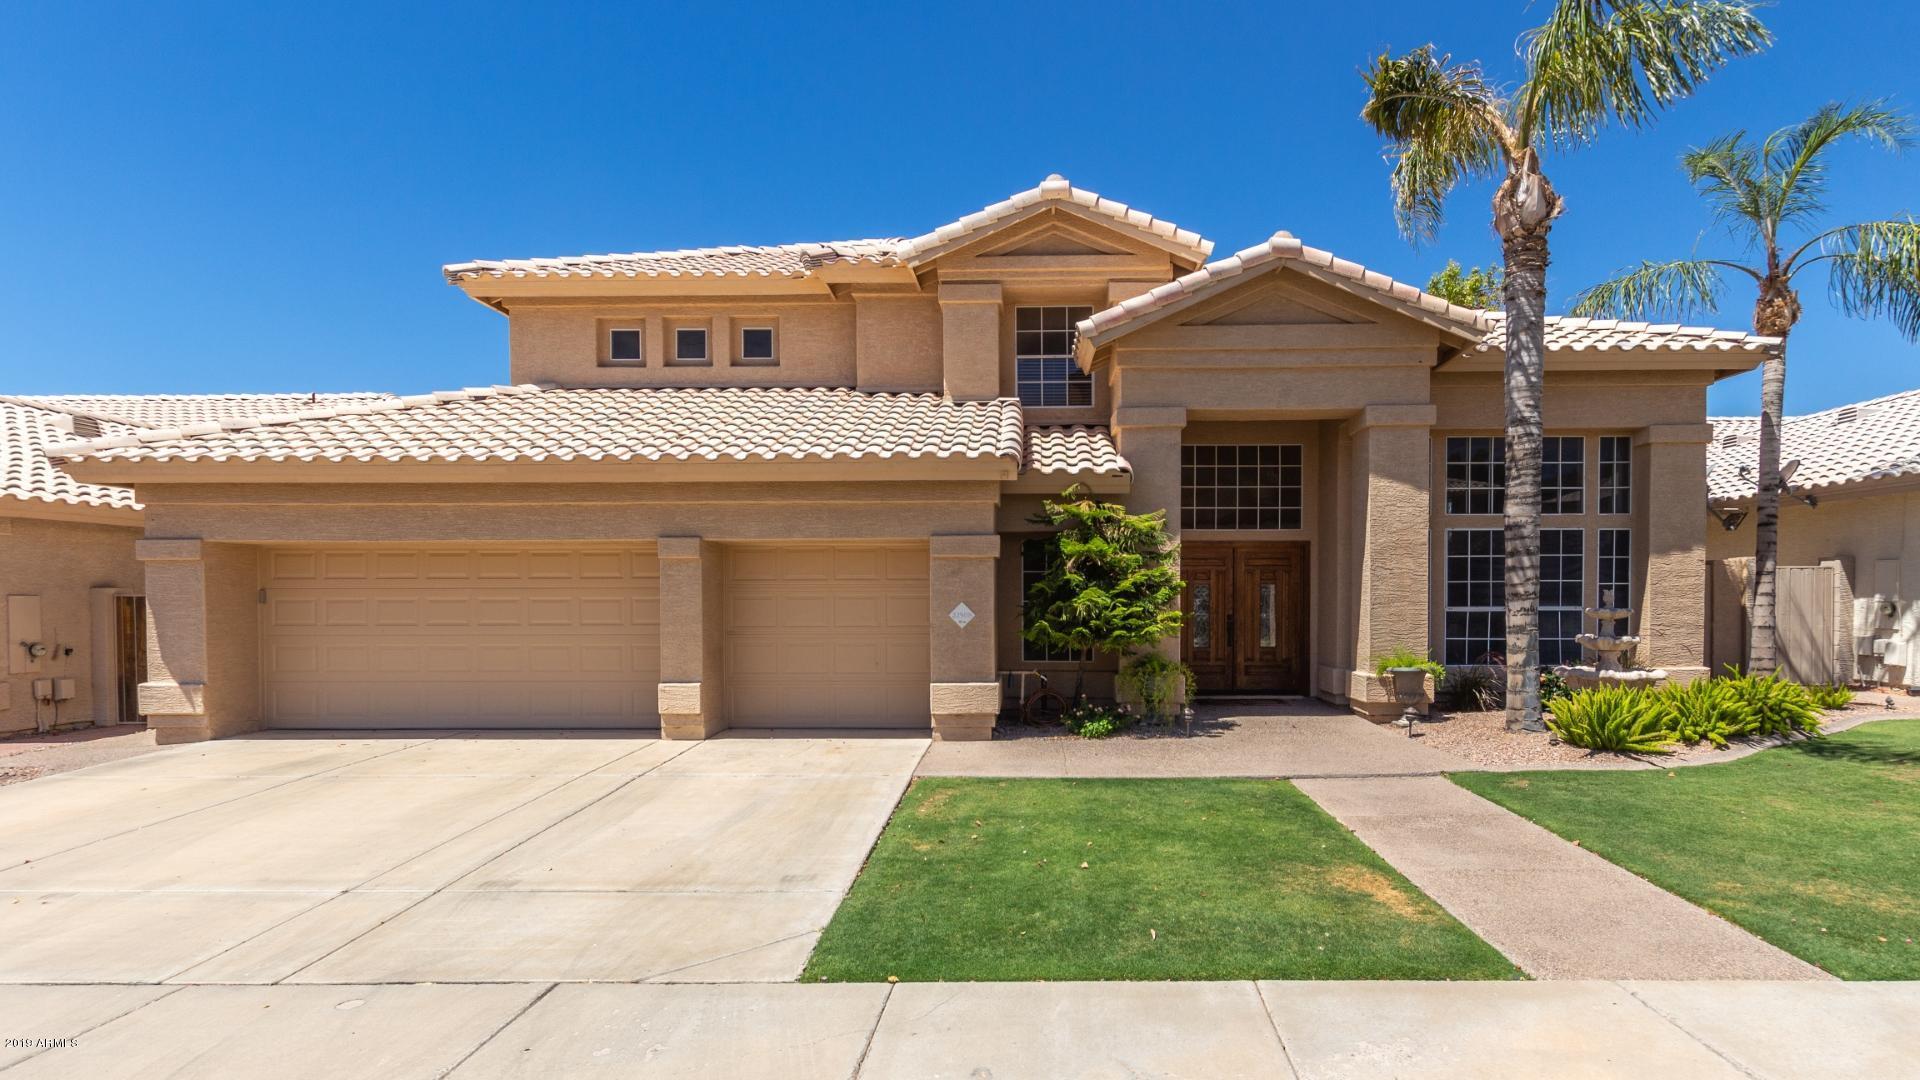 Photo of 22508 N 60TH Avenue, Glendale, AZ 85310